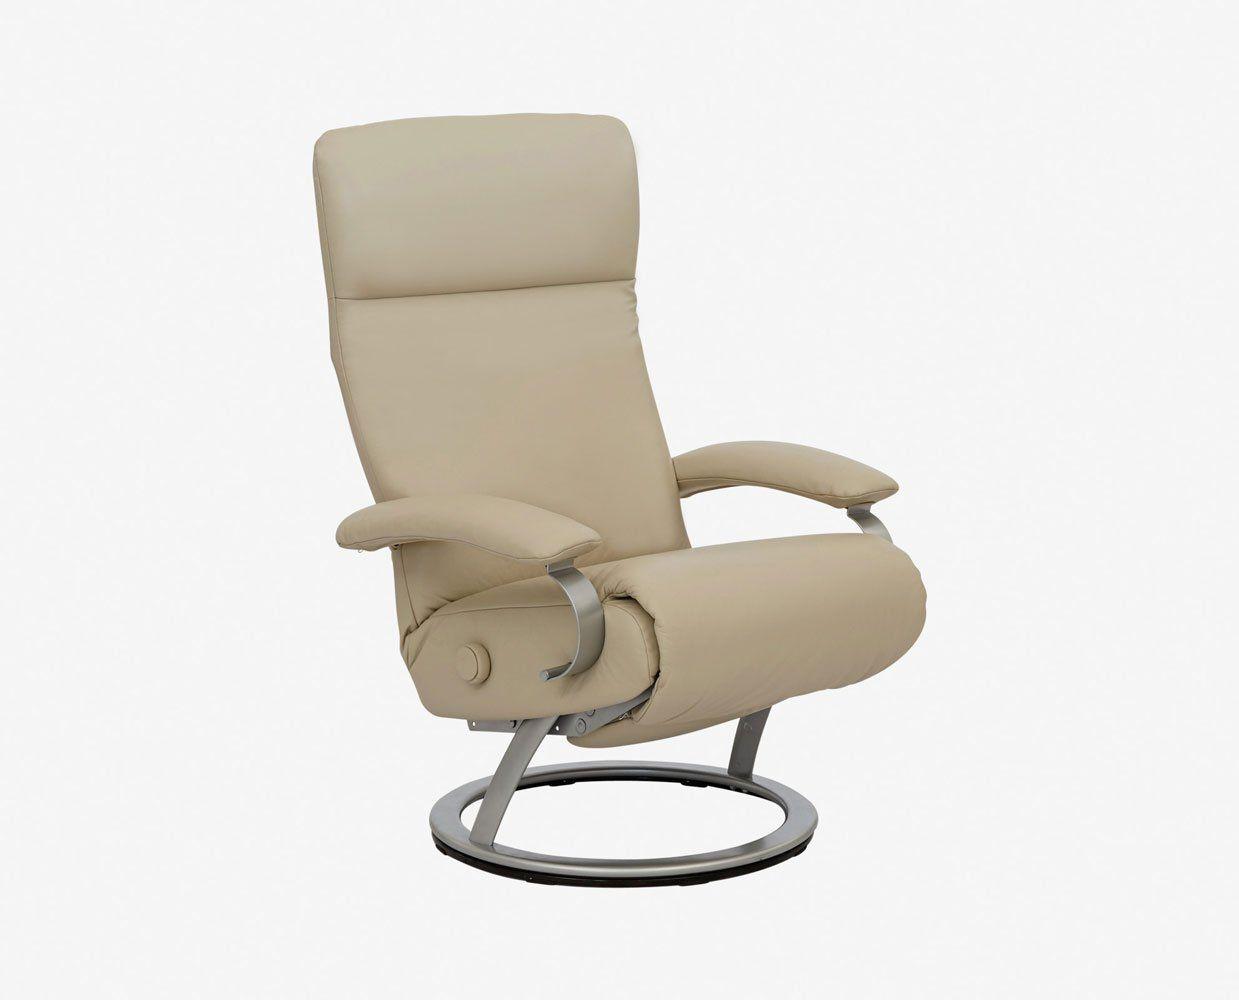 Stupendous Matteus Swivel Recliner Rv Storage Inside Swivel Machost Co Dining Chair Design Ideas Machostcouk